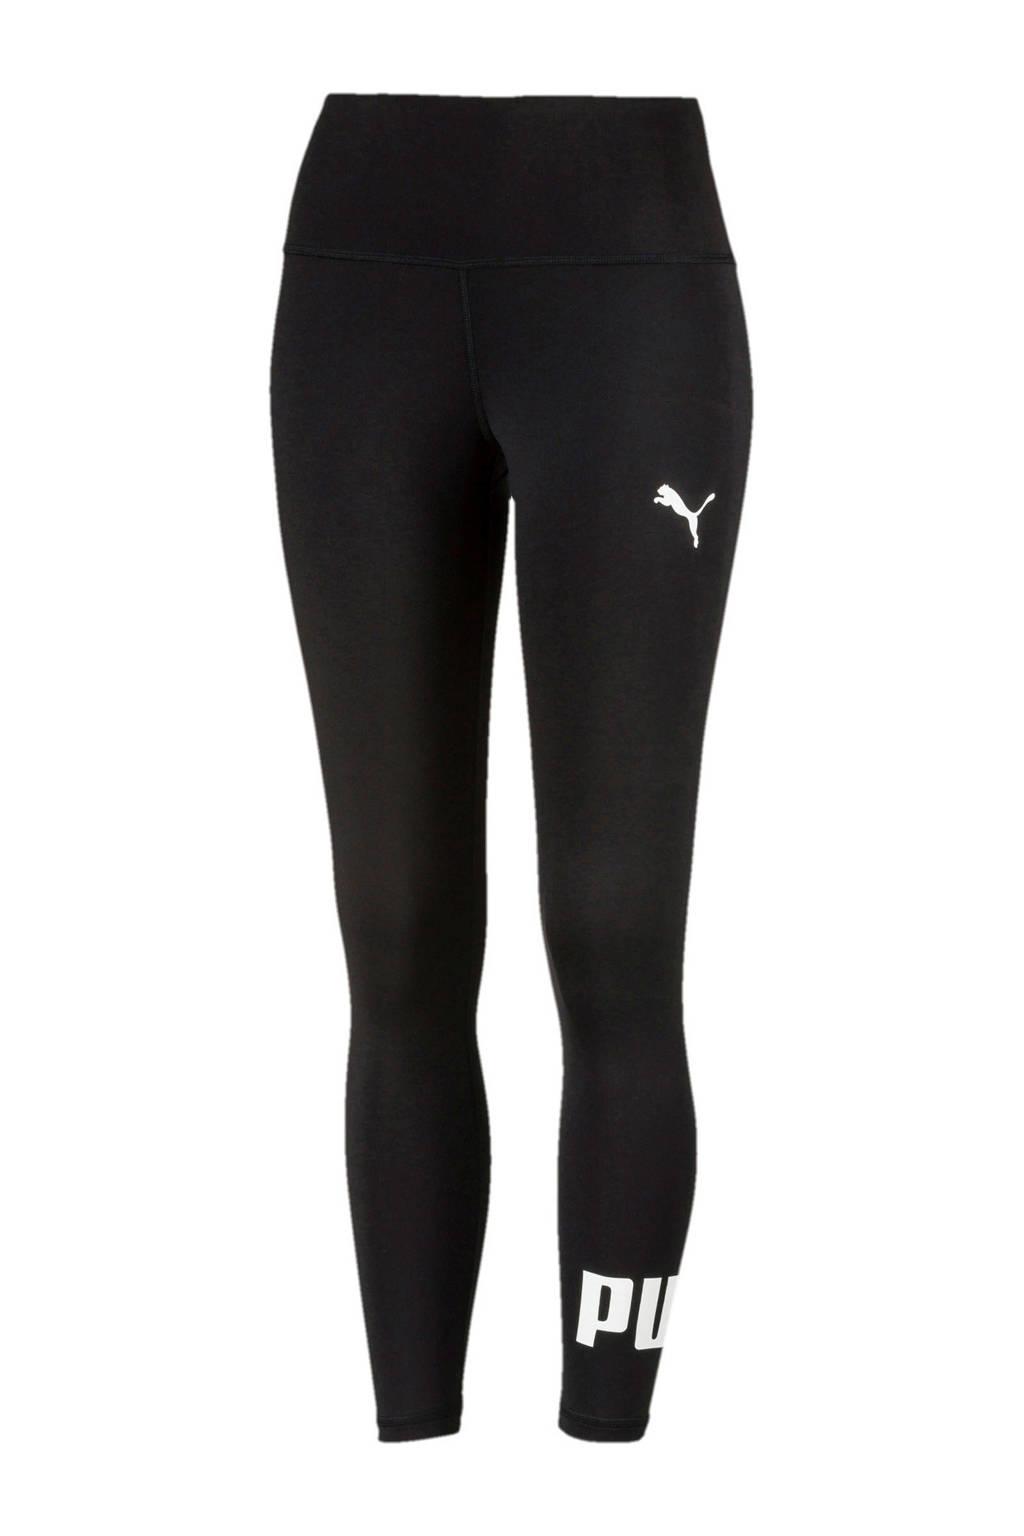 Puma legging zwart, Zwart